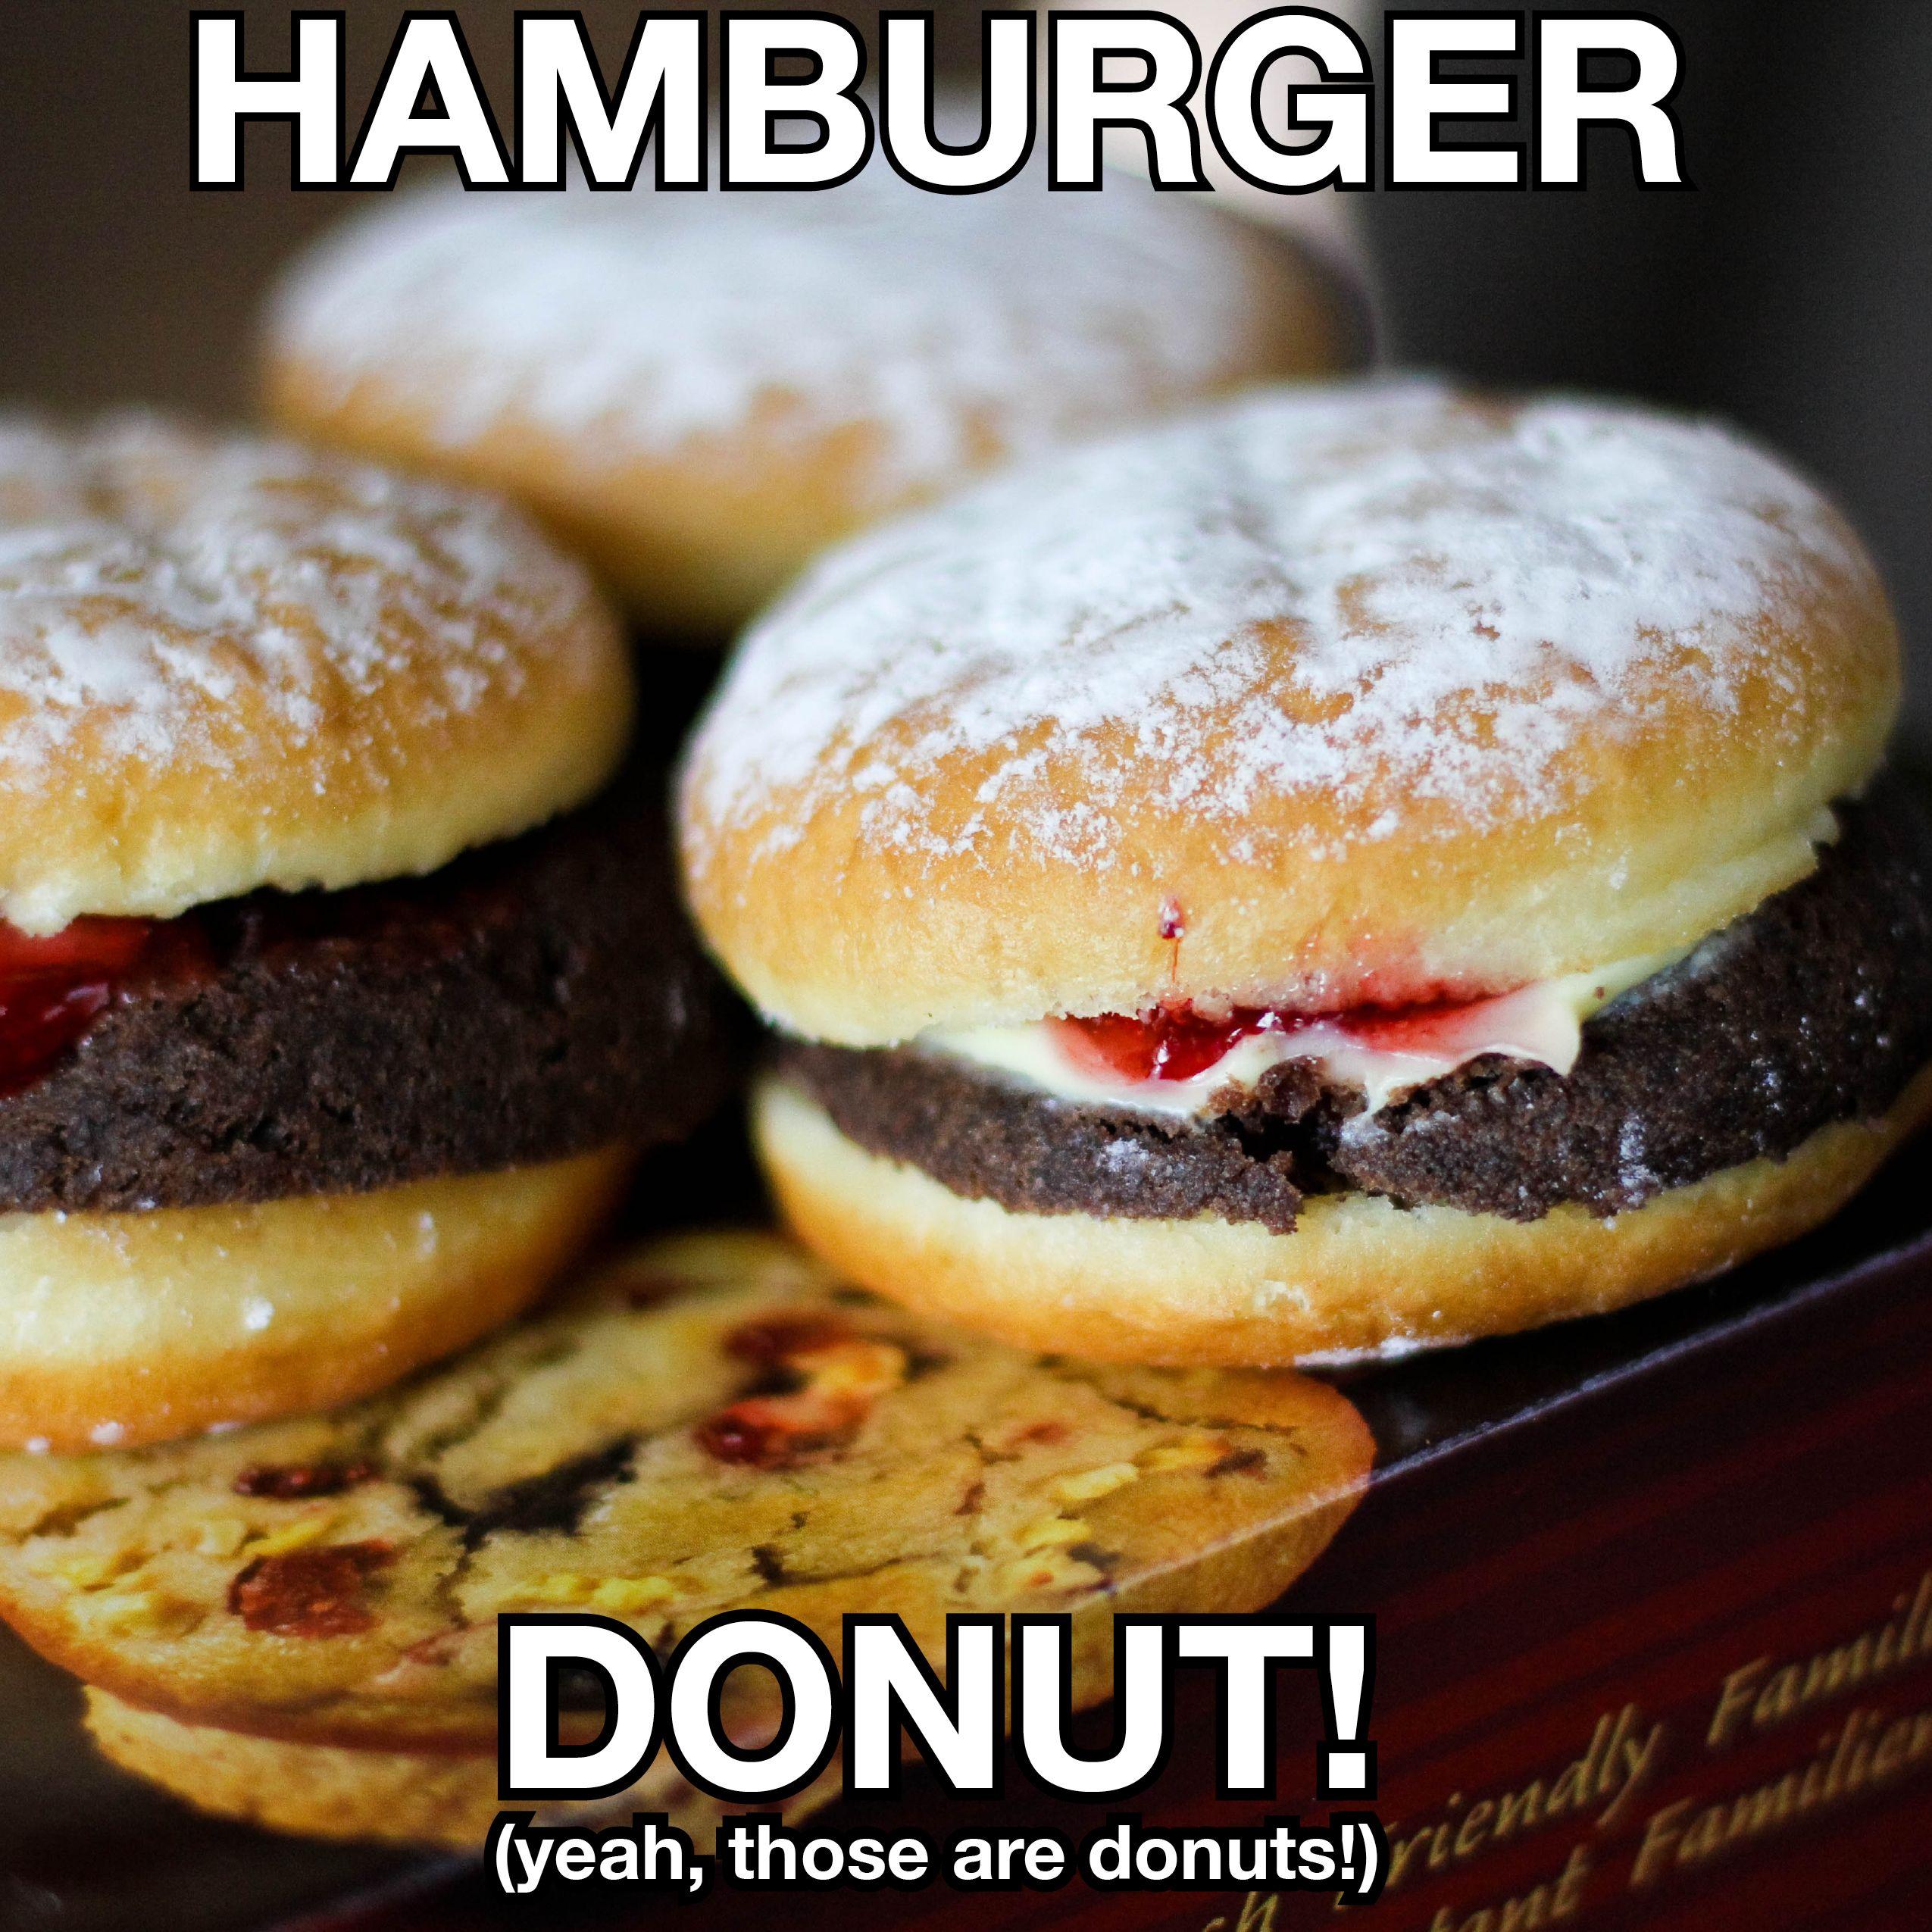 Tims Has A Hamburger Donut Regular And Chocolate Donuts